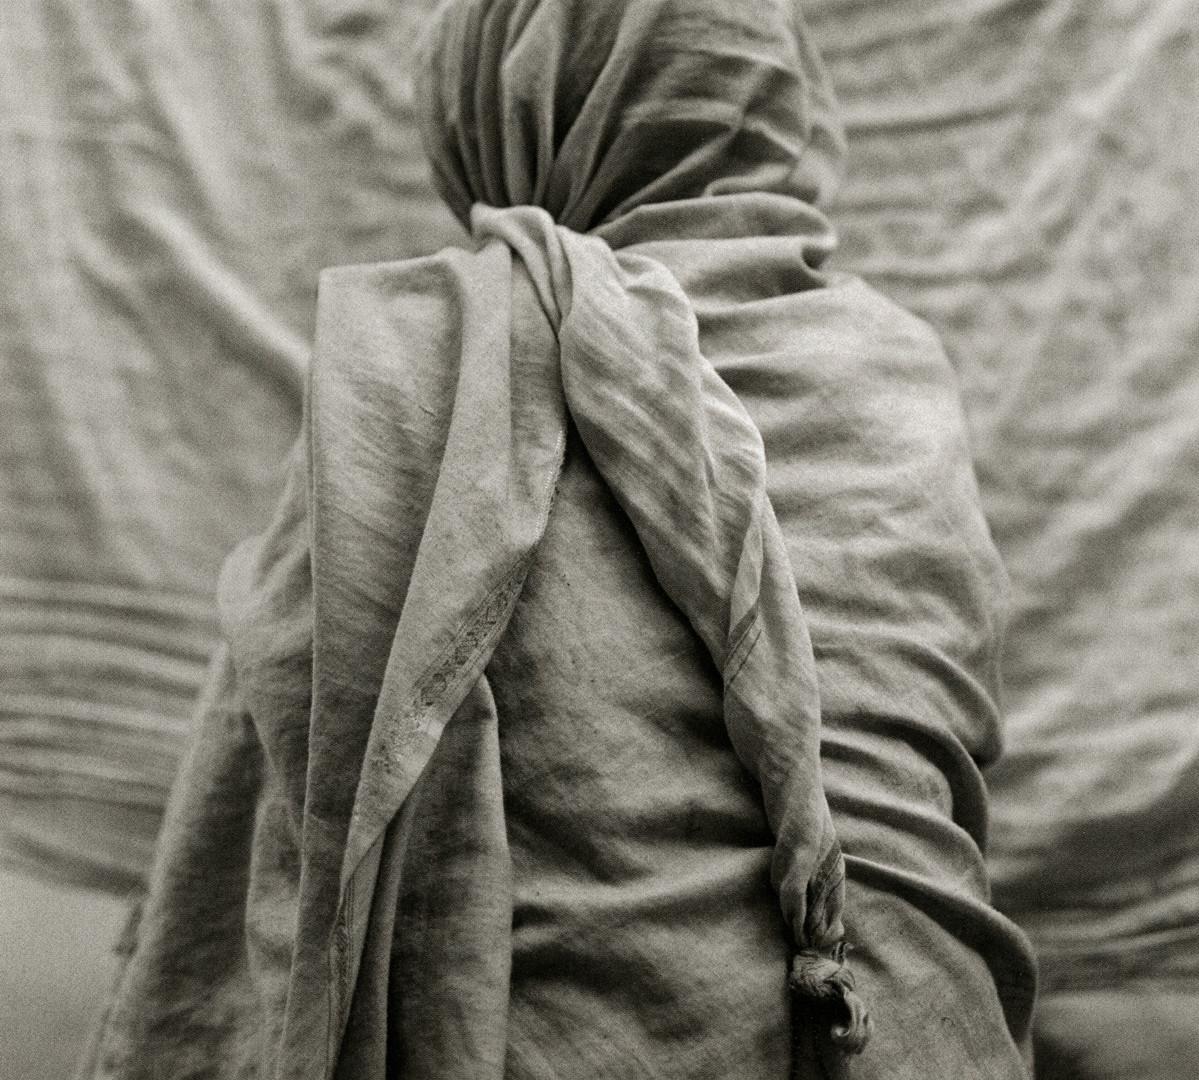 Fazal Sheikh, Sarla Goraye ('Simple'), Vrindavan, India, 2004